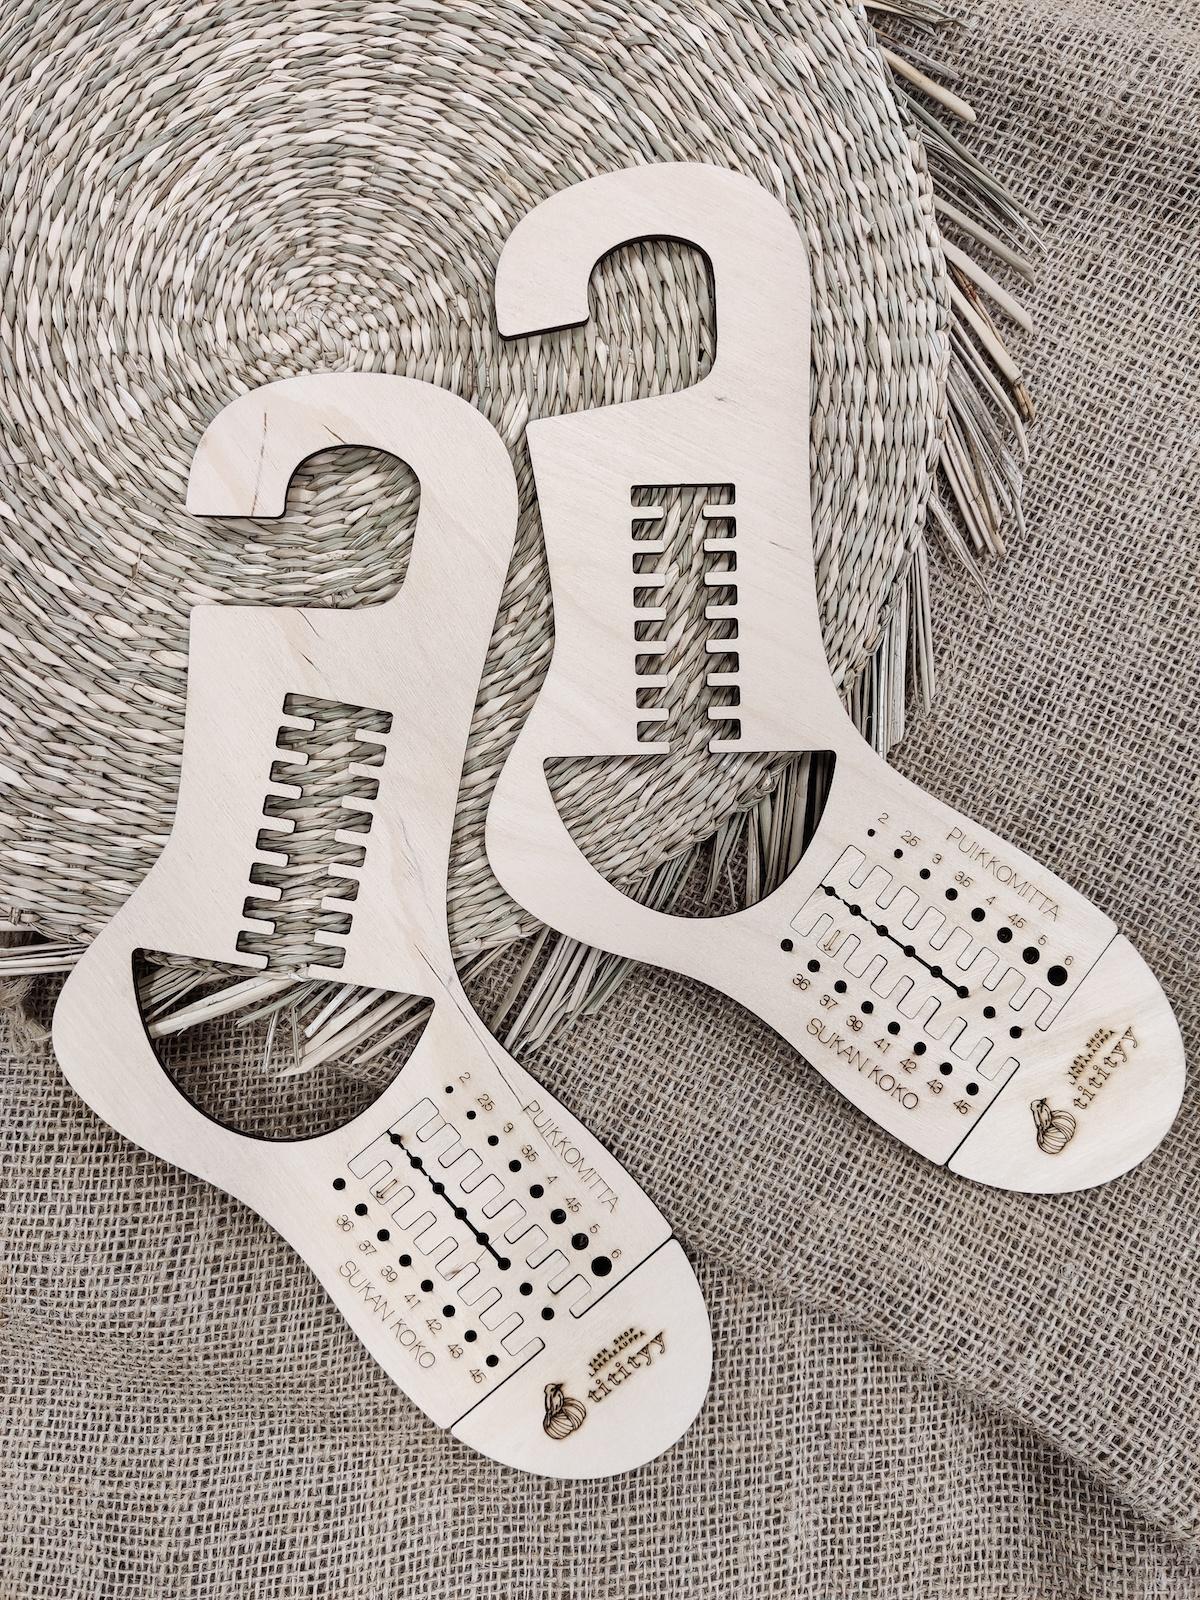 Titityy adjustable sock blocker